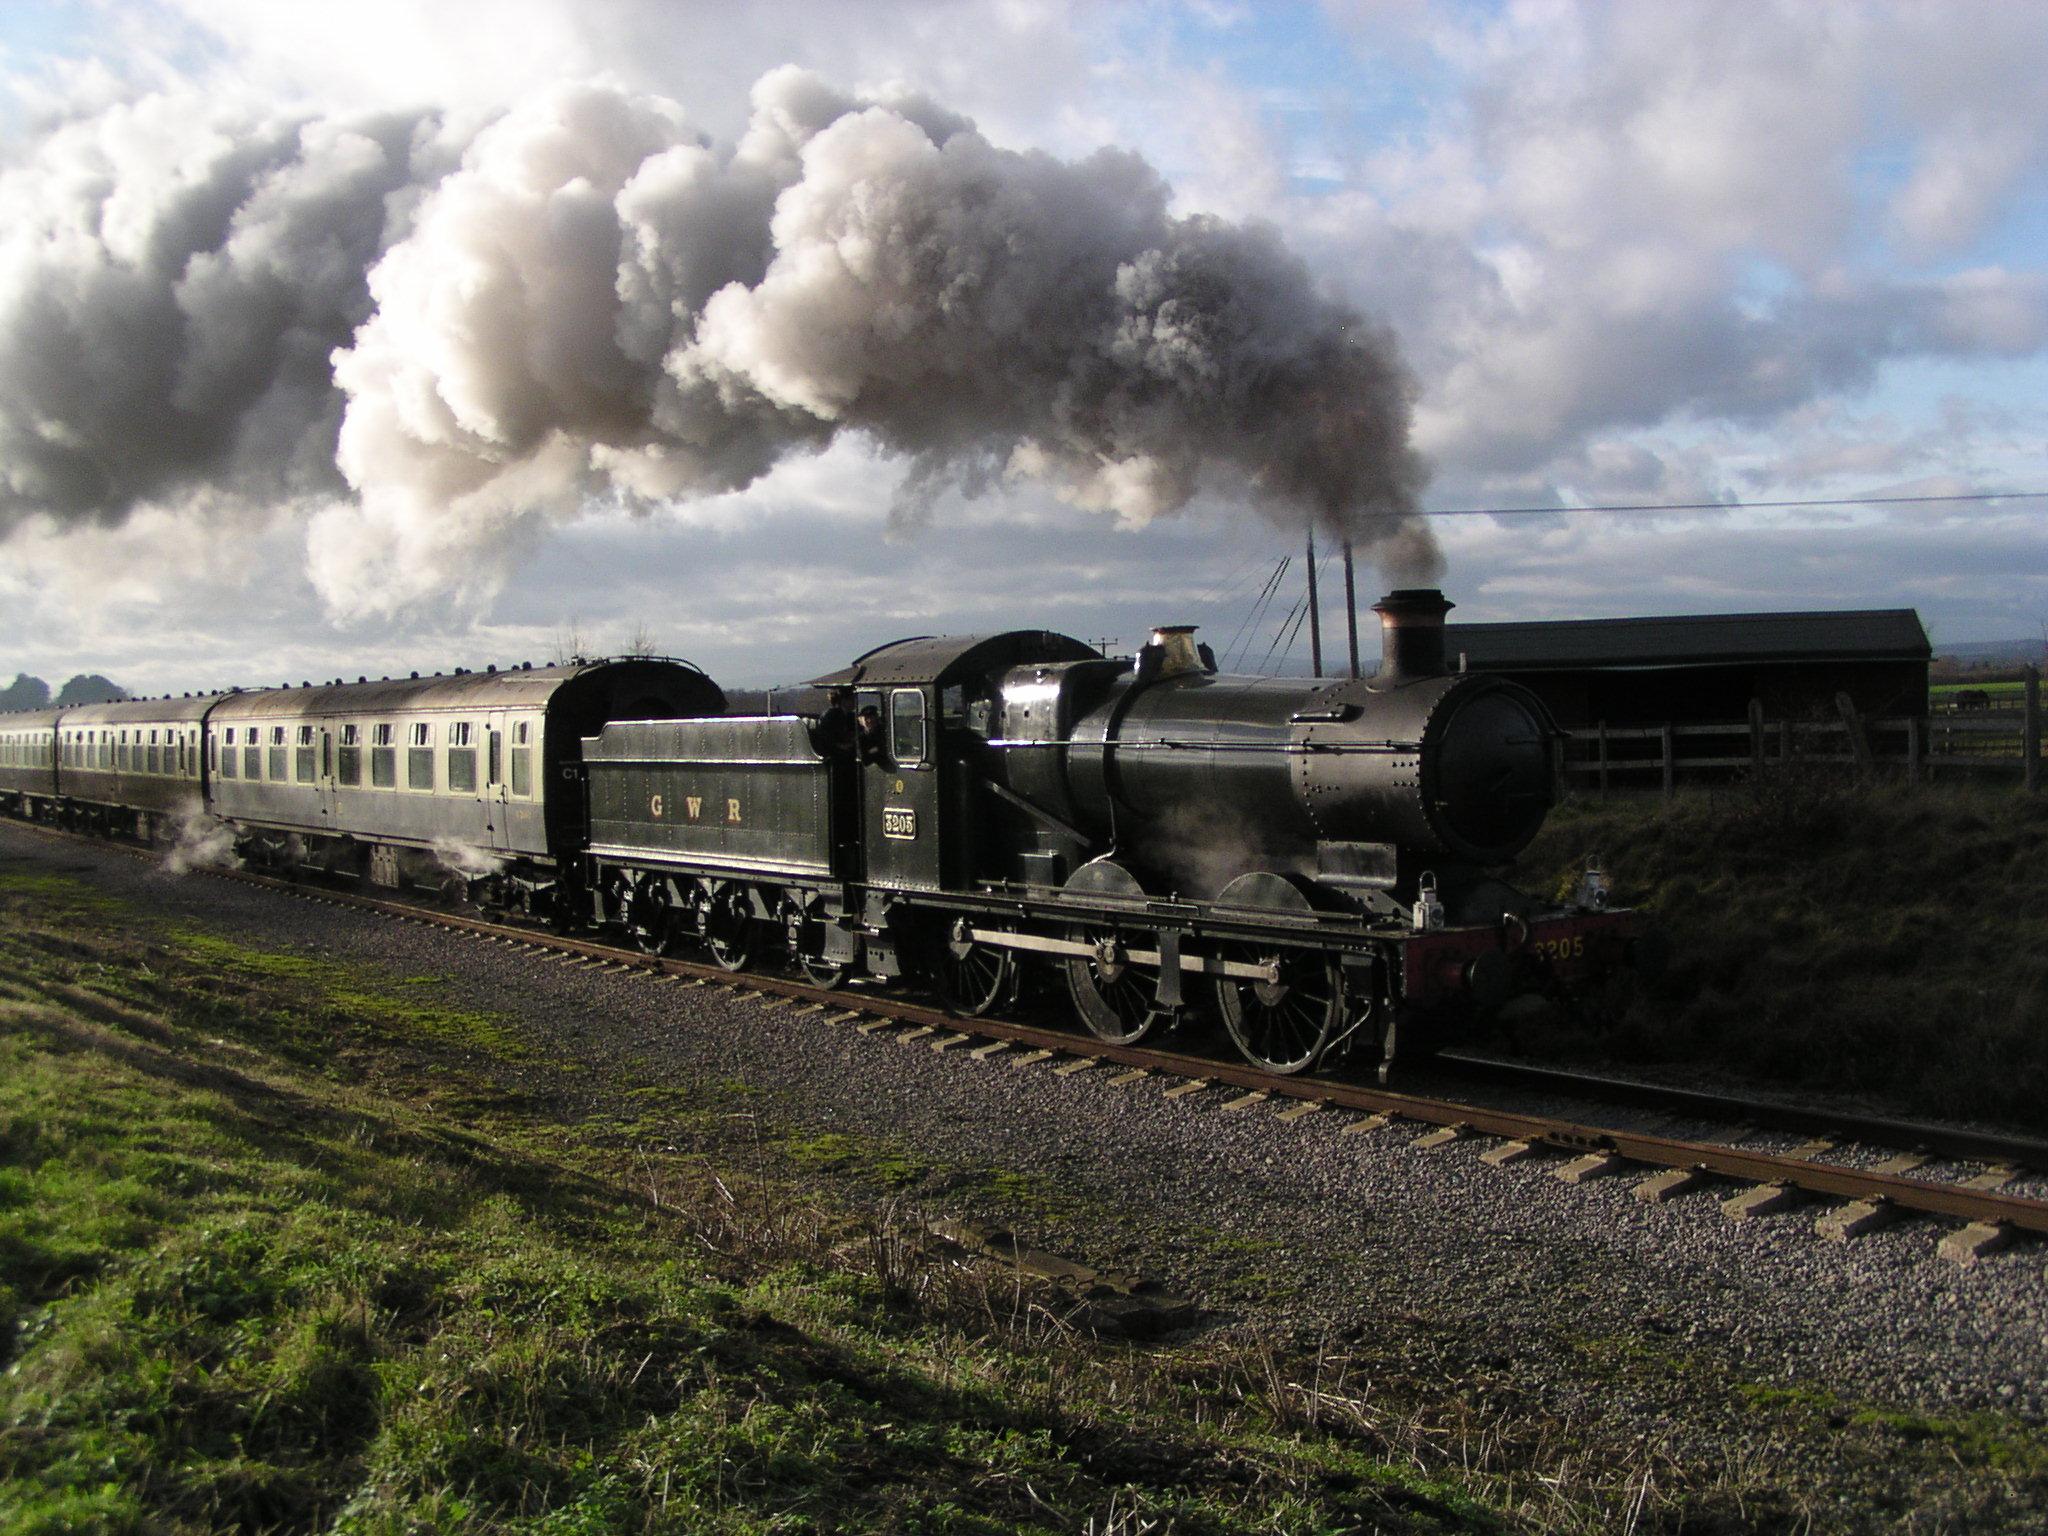 File:GWR 2251 Class 3205 departing Cheltenham Racecourse.JPG